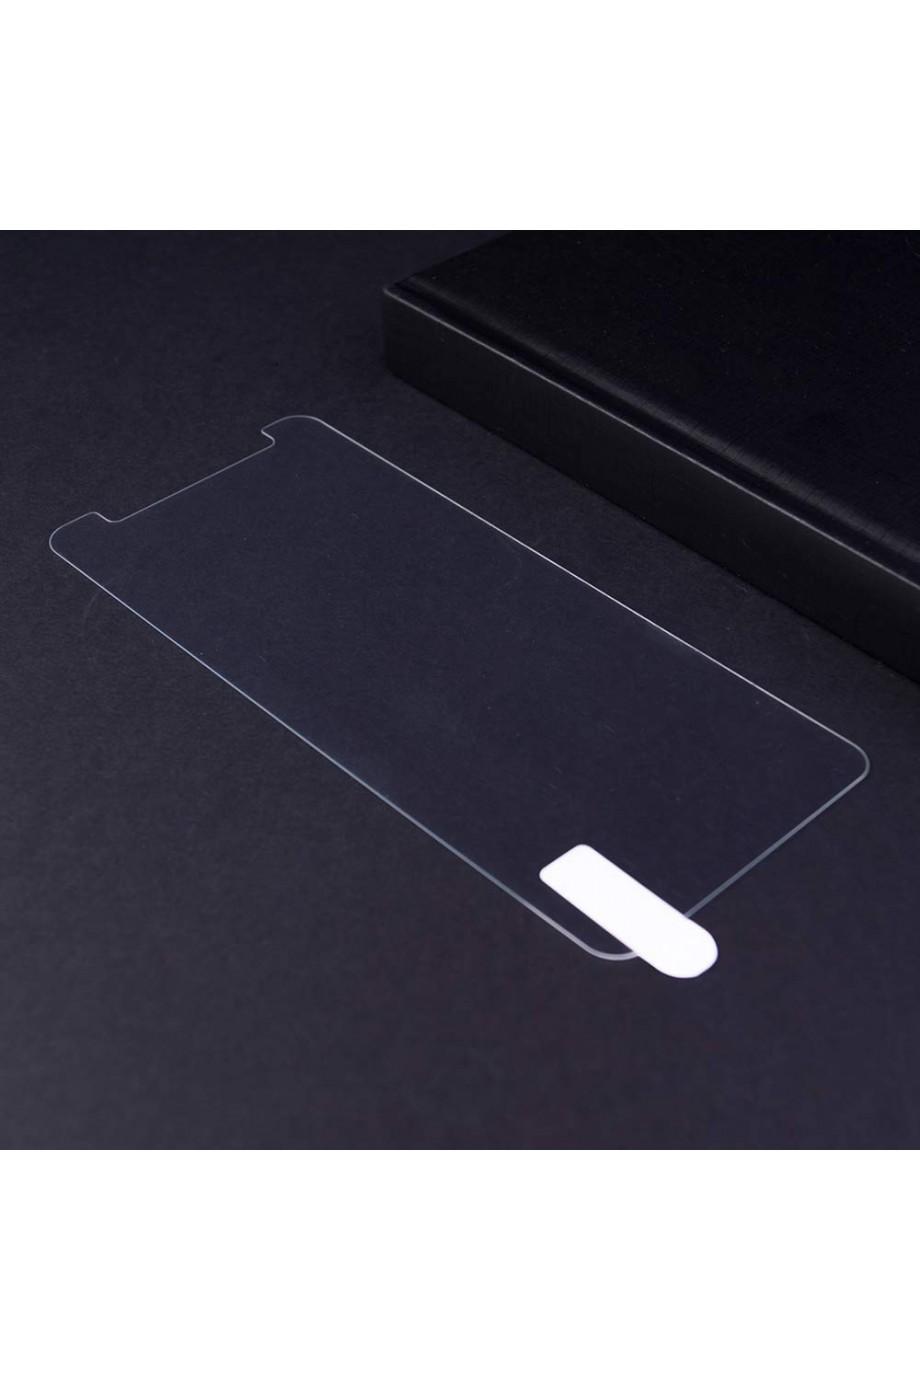 Защитное стекло Mikomo для Huawei Y6 Prime 2018